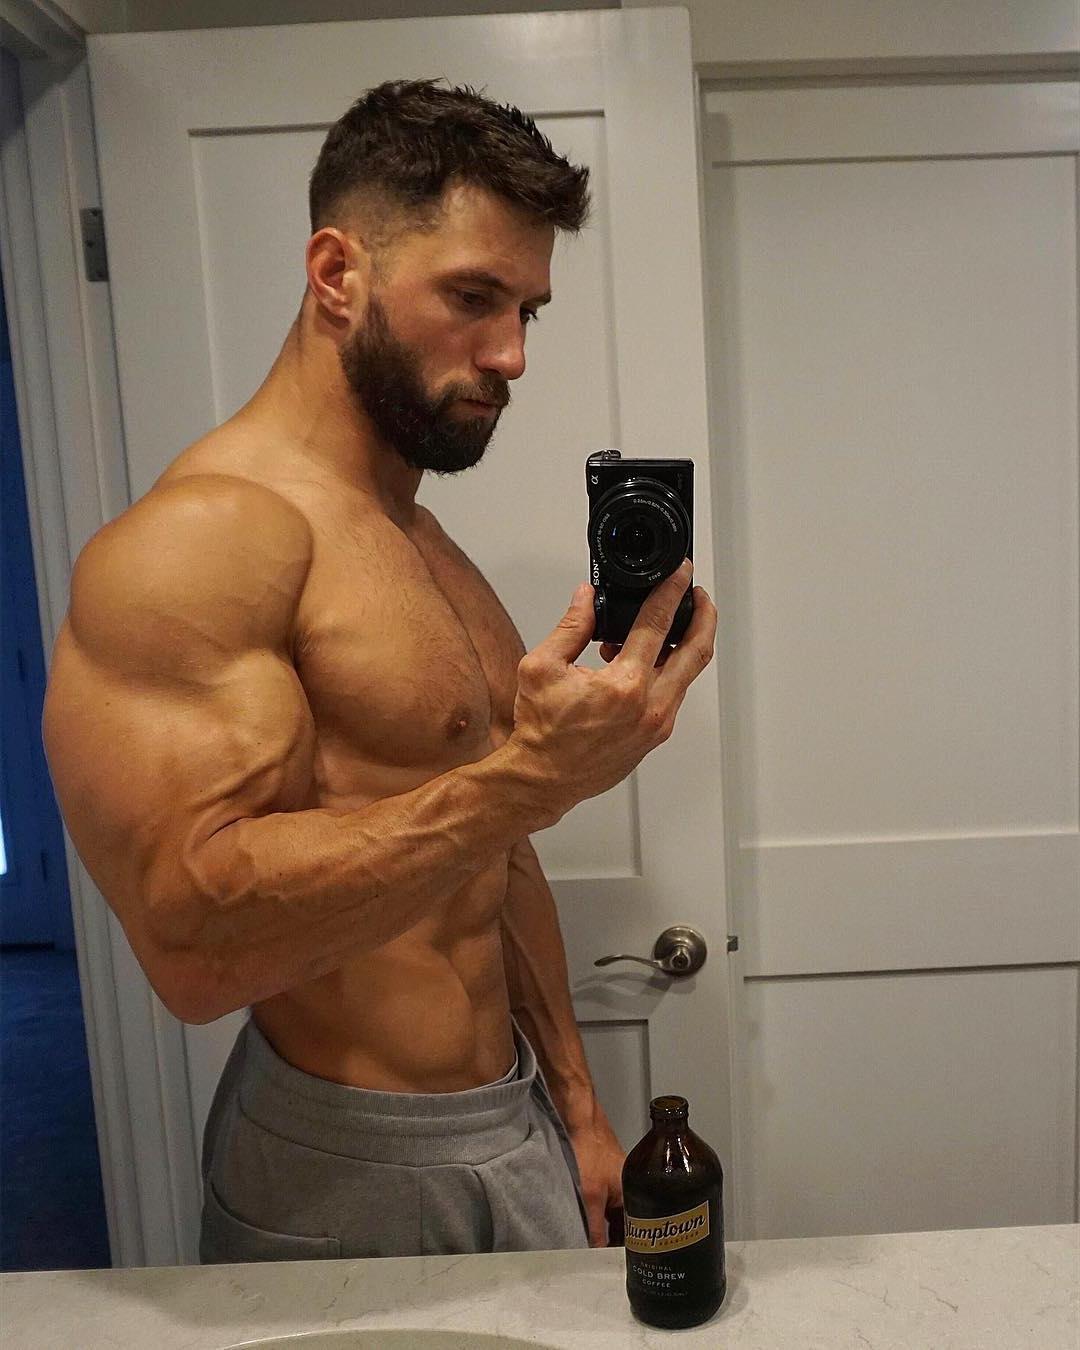 hot-bearded-guys-huge-swole-biceps-selfie